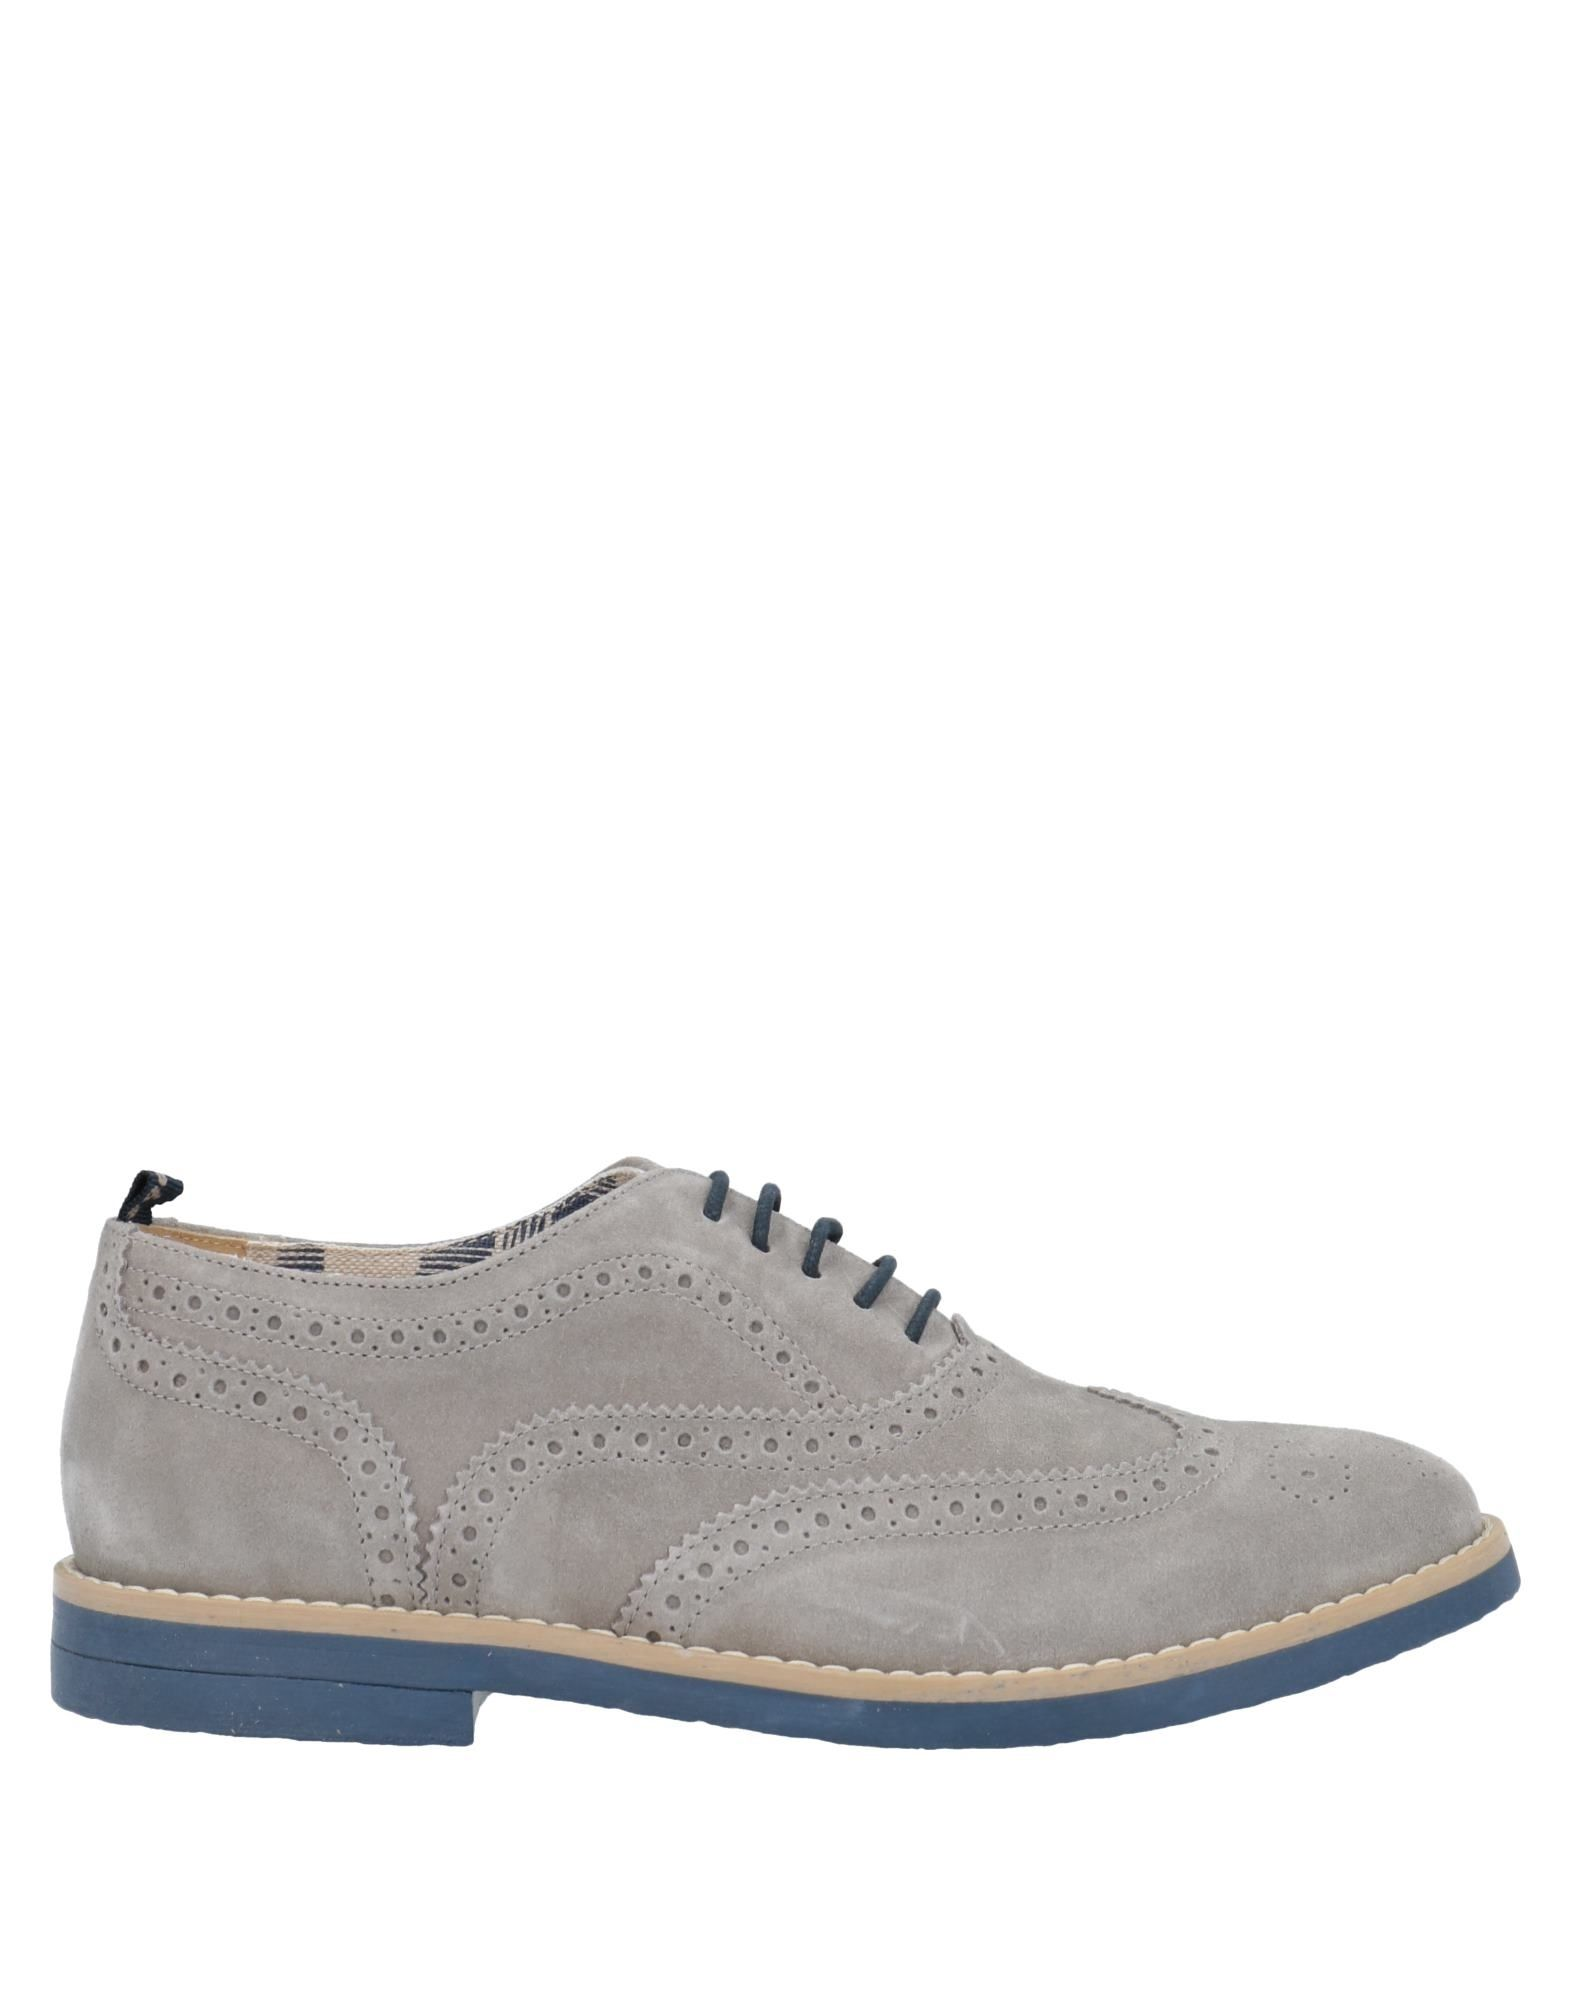 SNOBS® Обувь на шнурках обувь 2015 тренды